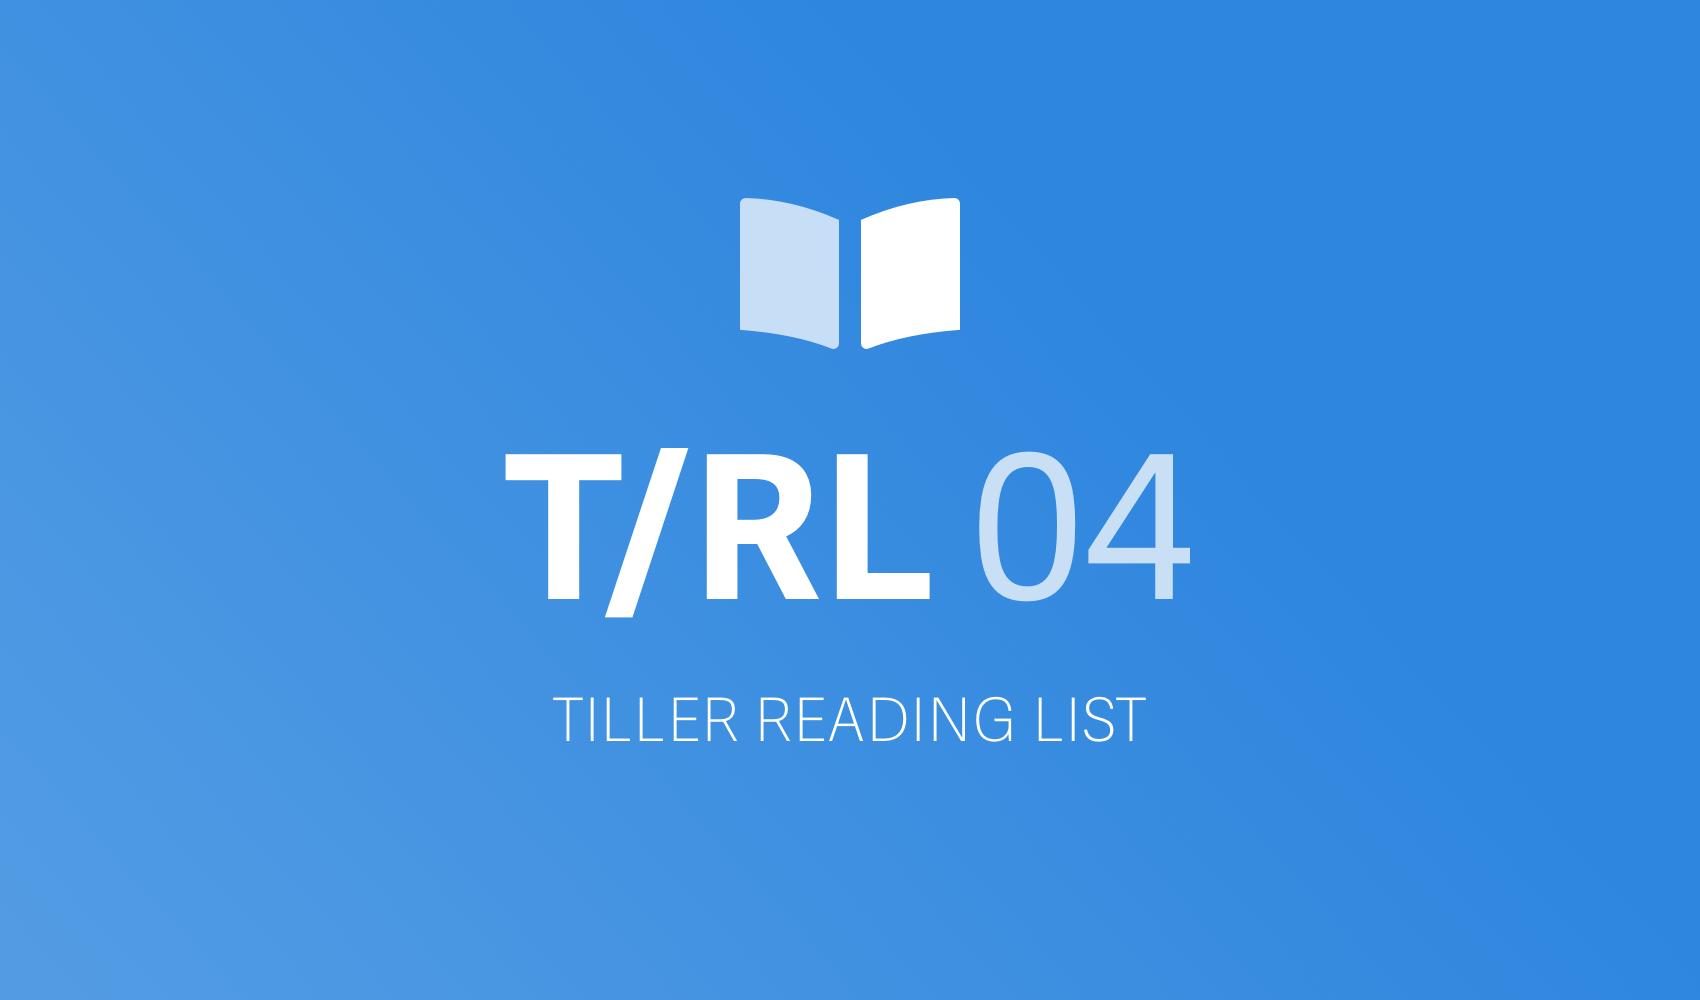 TILLER READING LIST